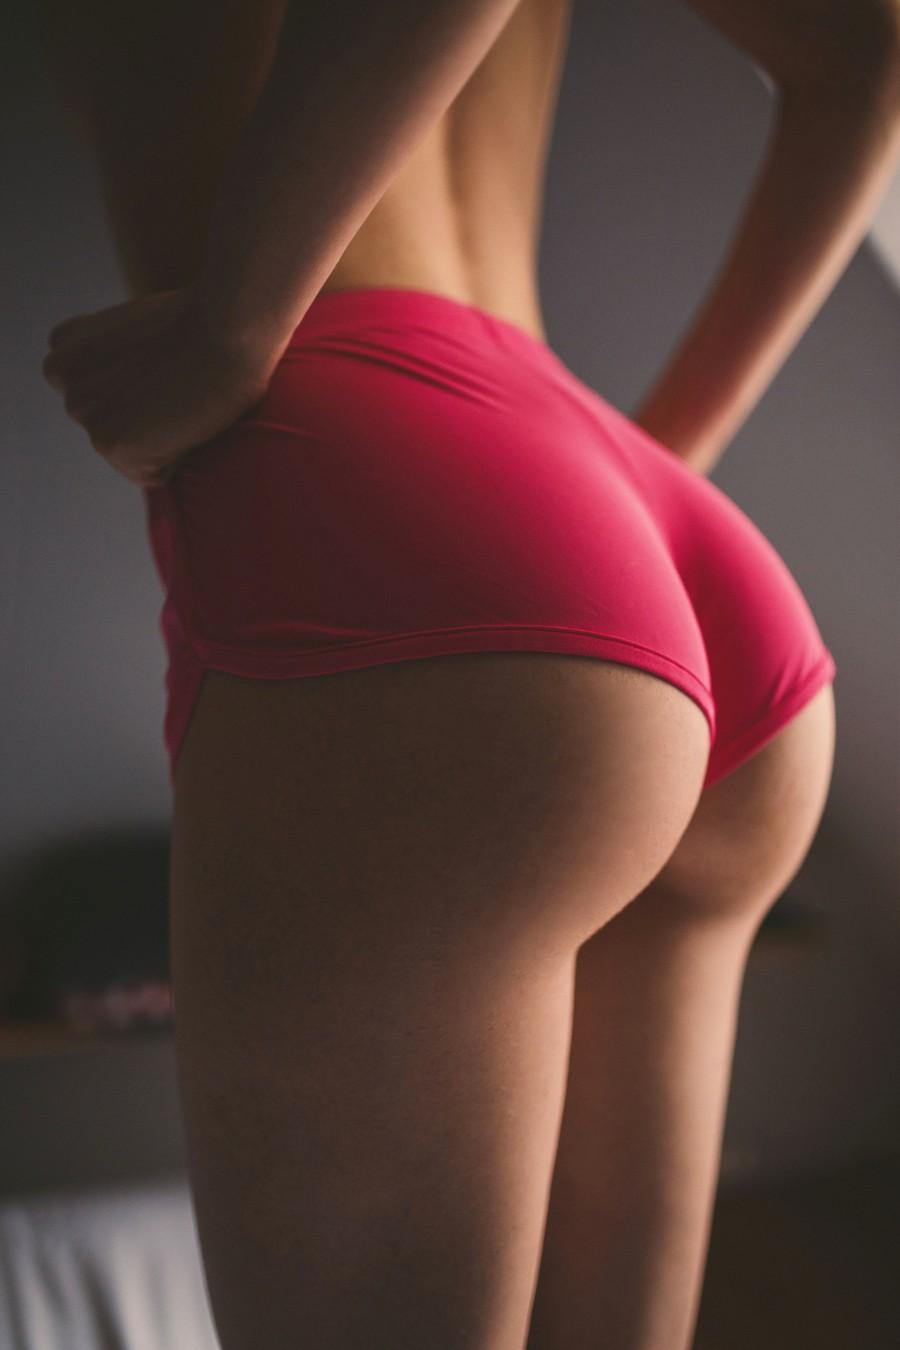 порно огромная попа фото